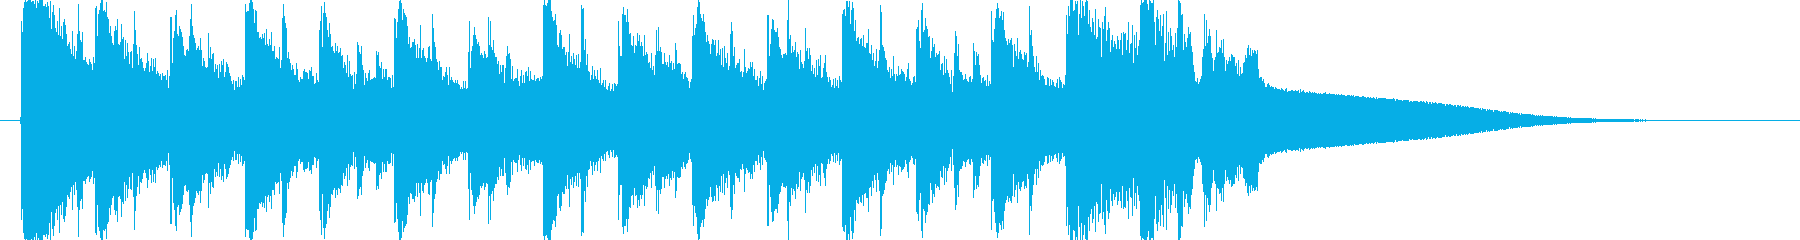 EDMの10秒ジングルですの再生済みの波形